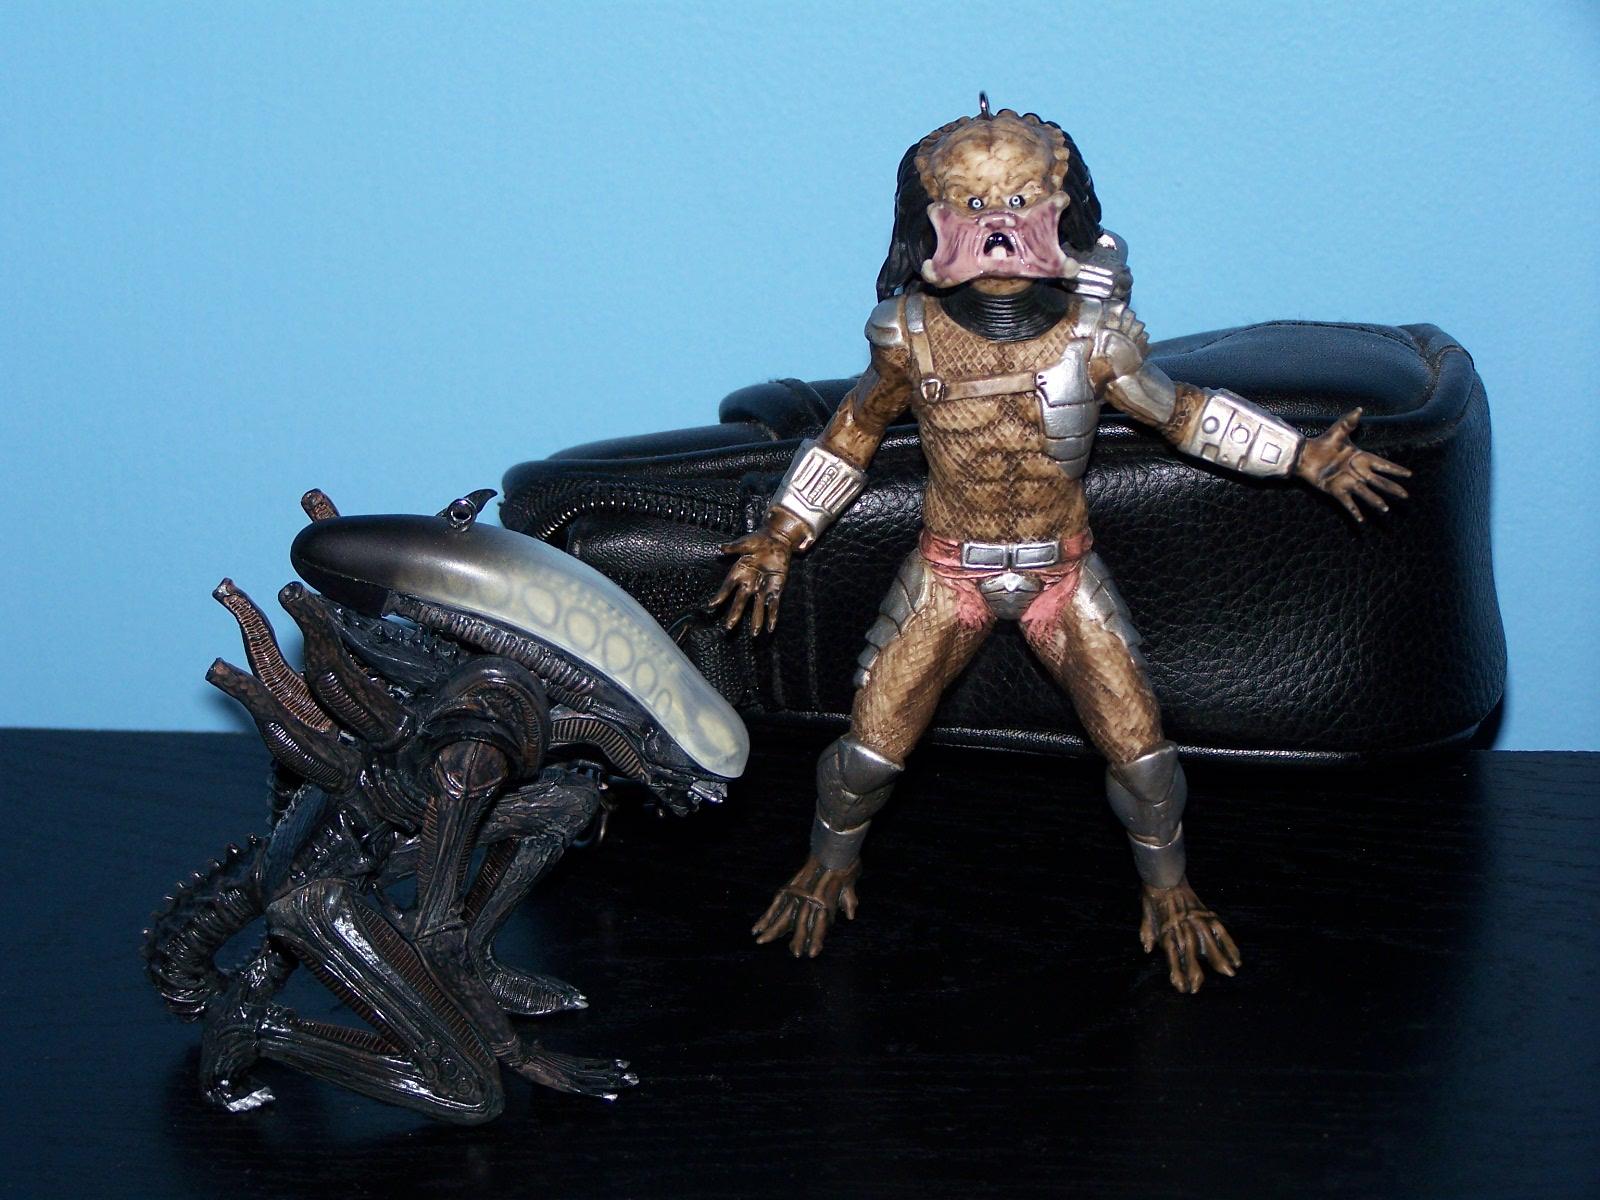 A Look at Hallmarks Predator Ornament